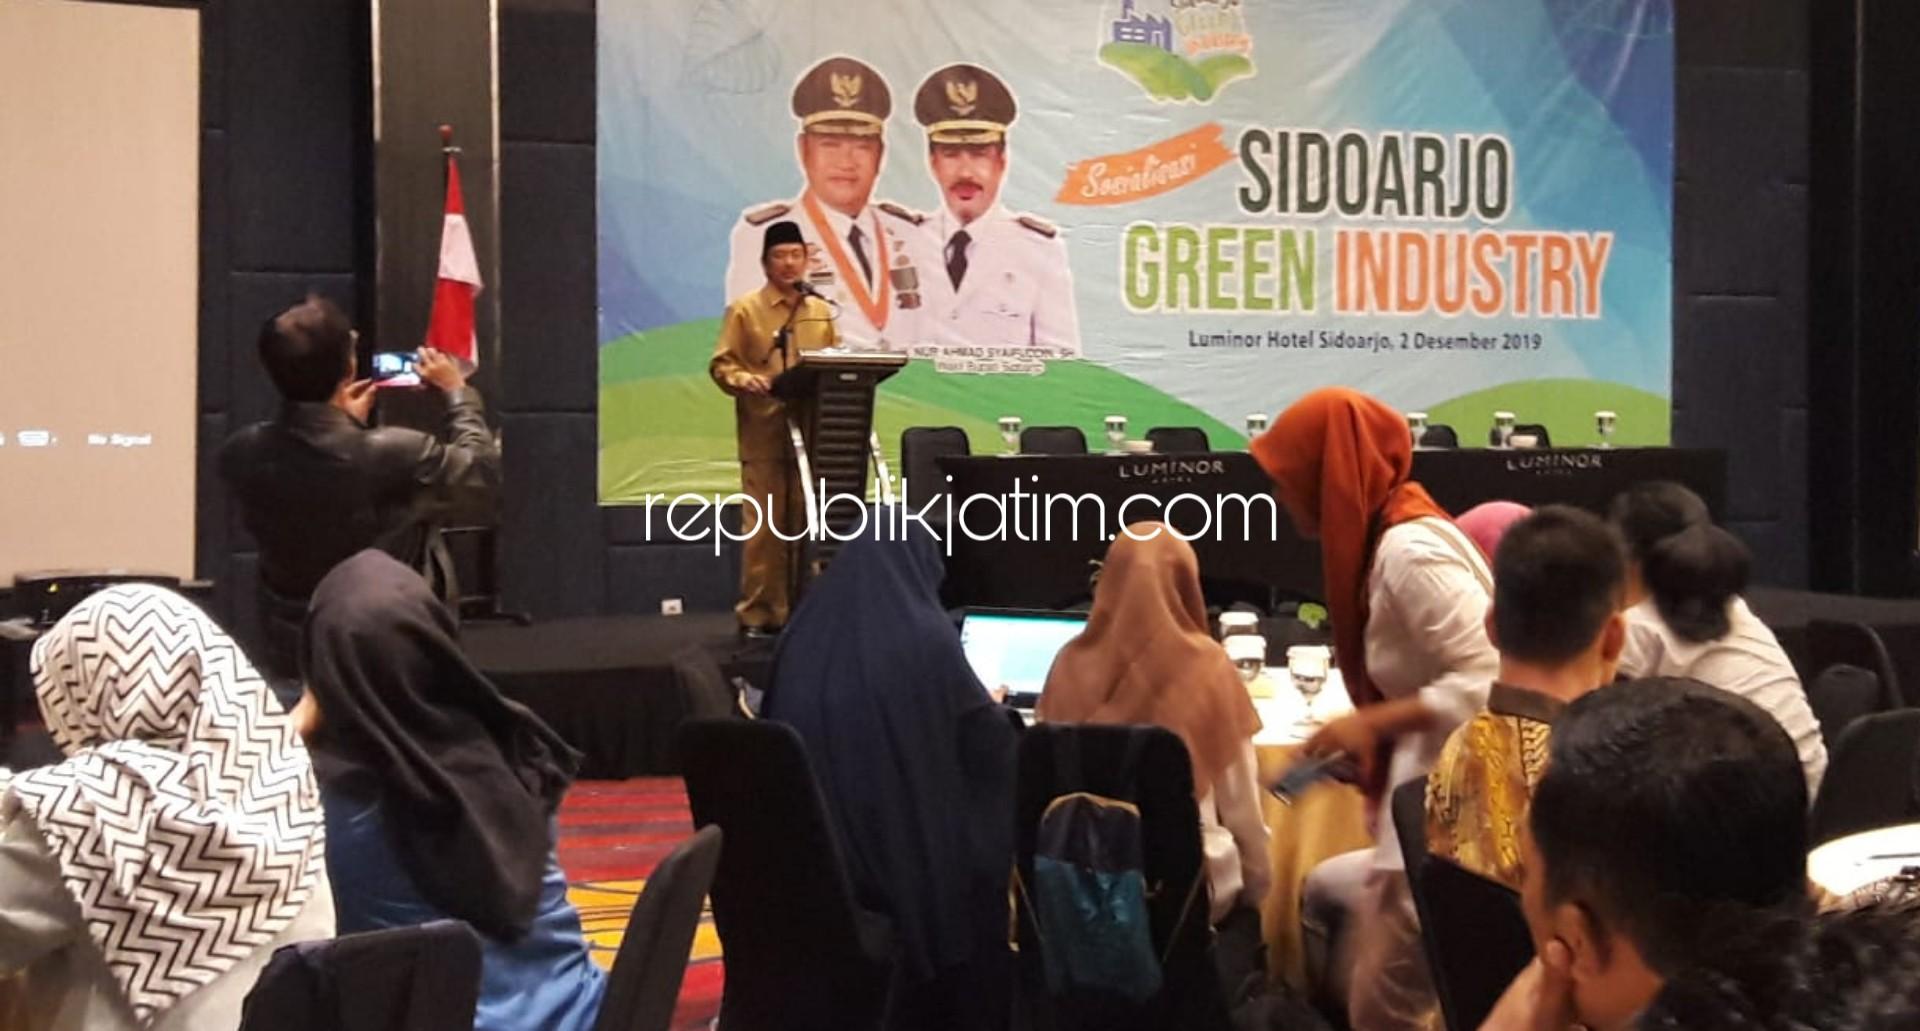 Wabup Minta Perusahan di Sidoarjo Jaga Keseimbangan Lingkungan